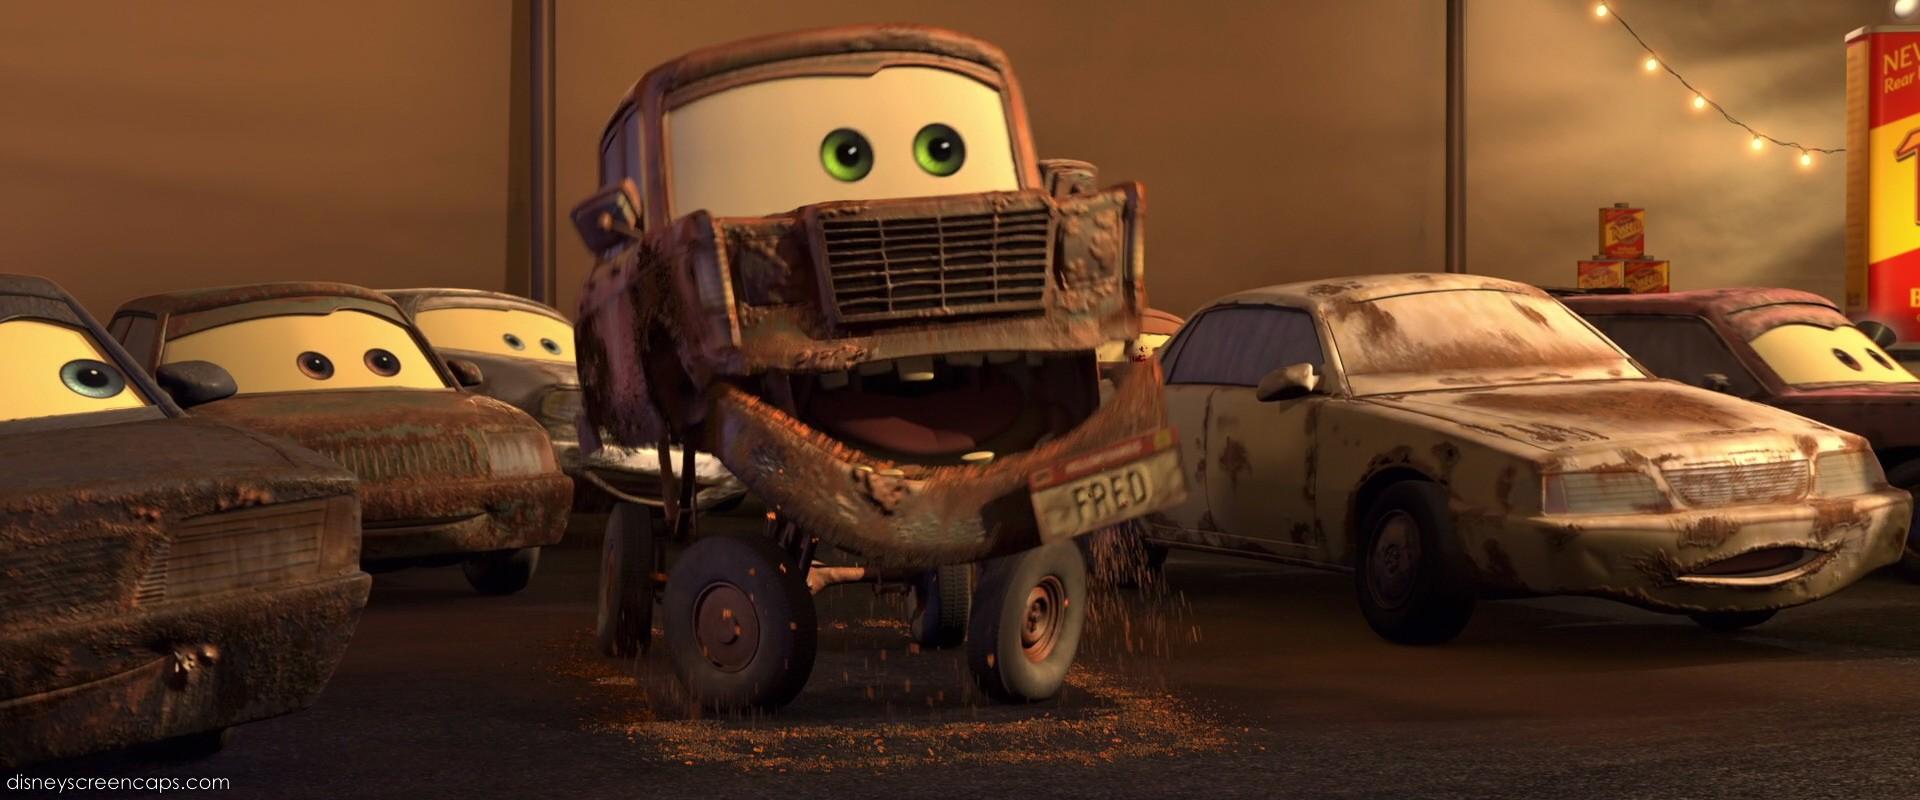 image fred pixar wiki disney pixar animation